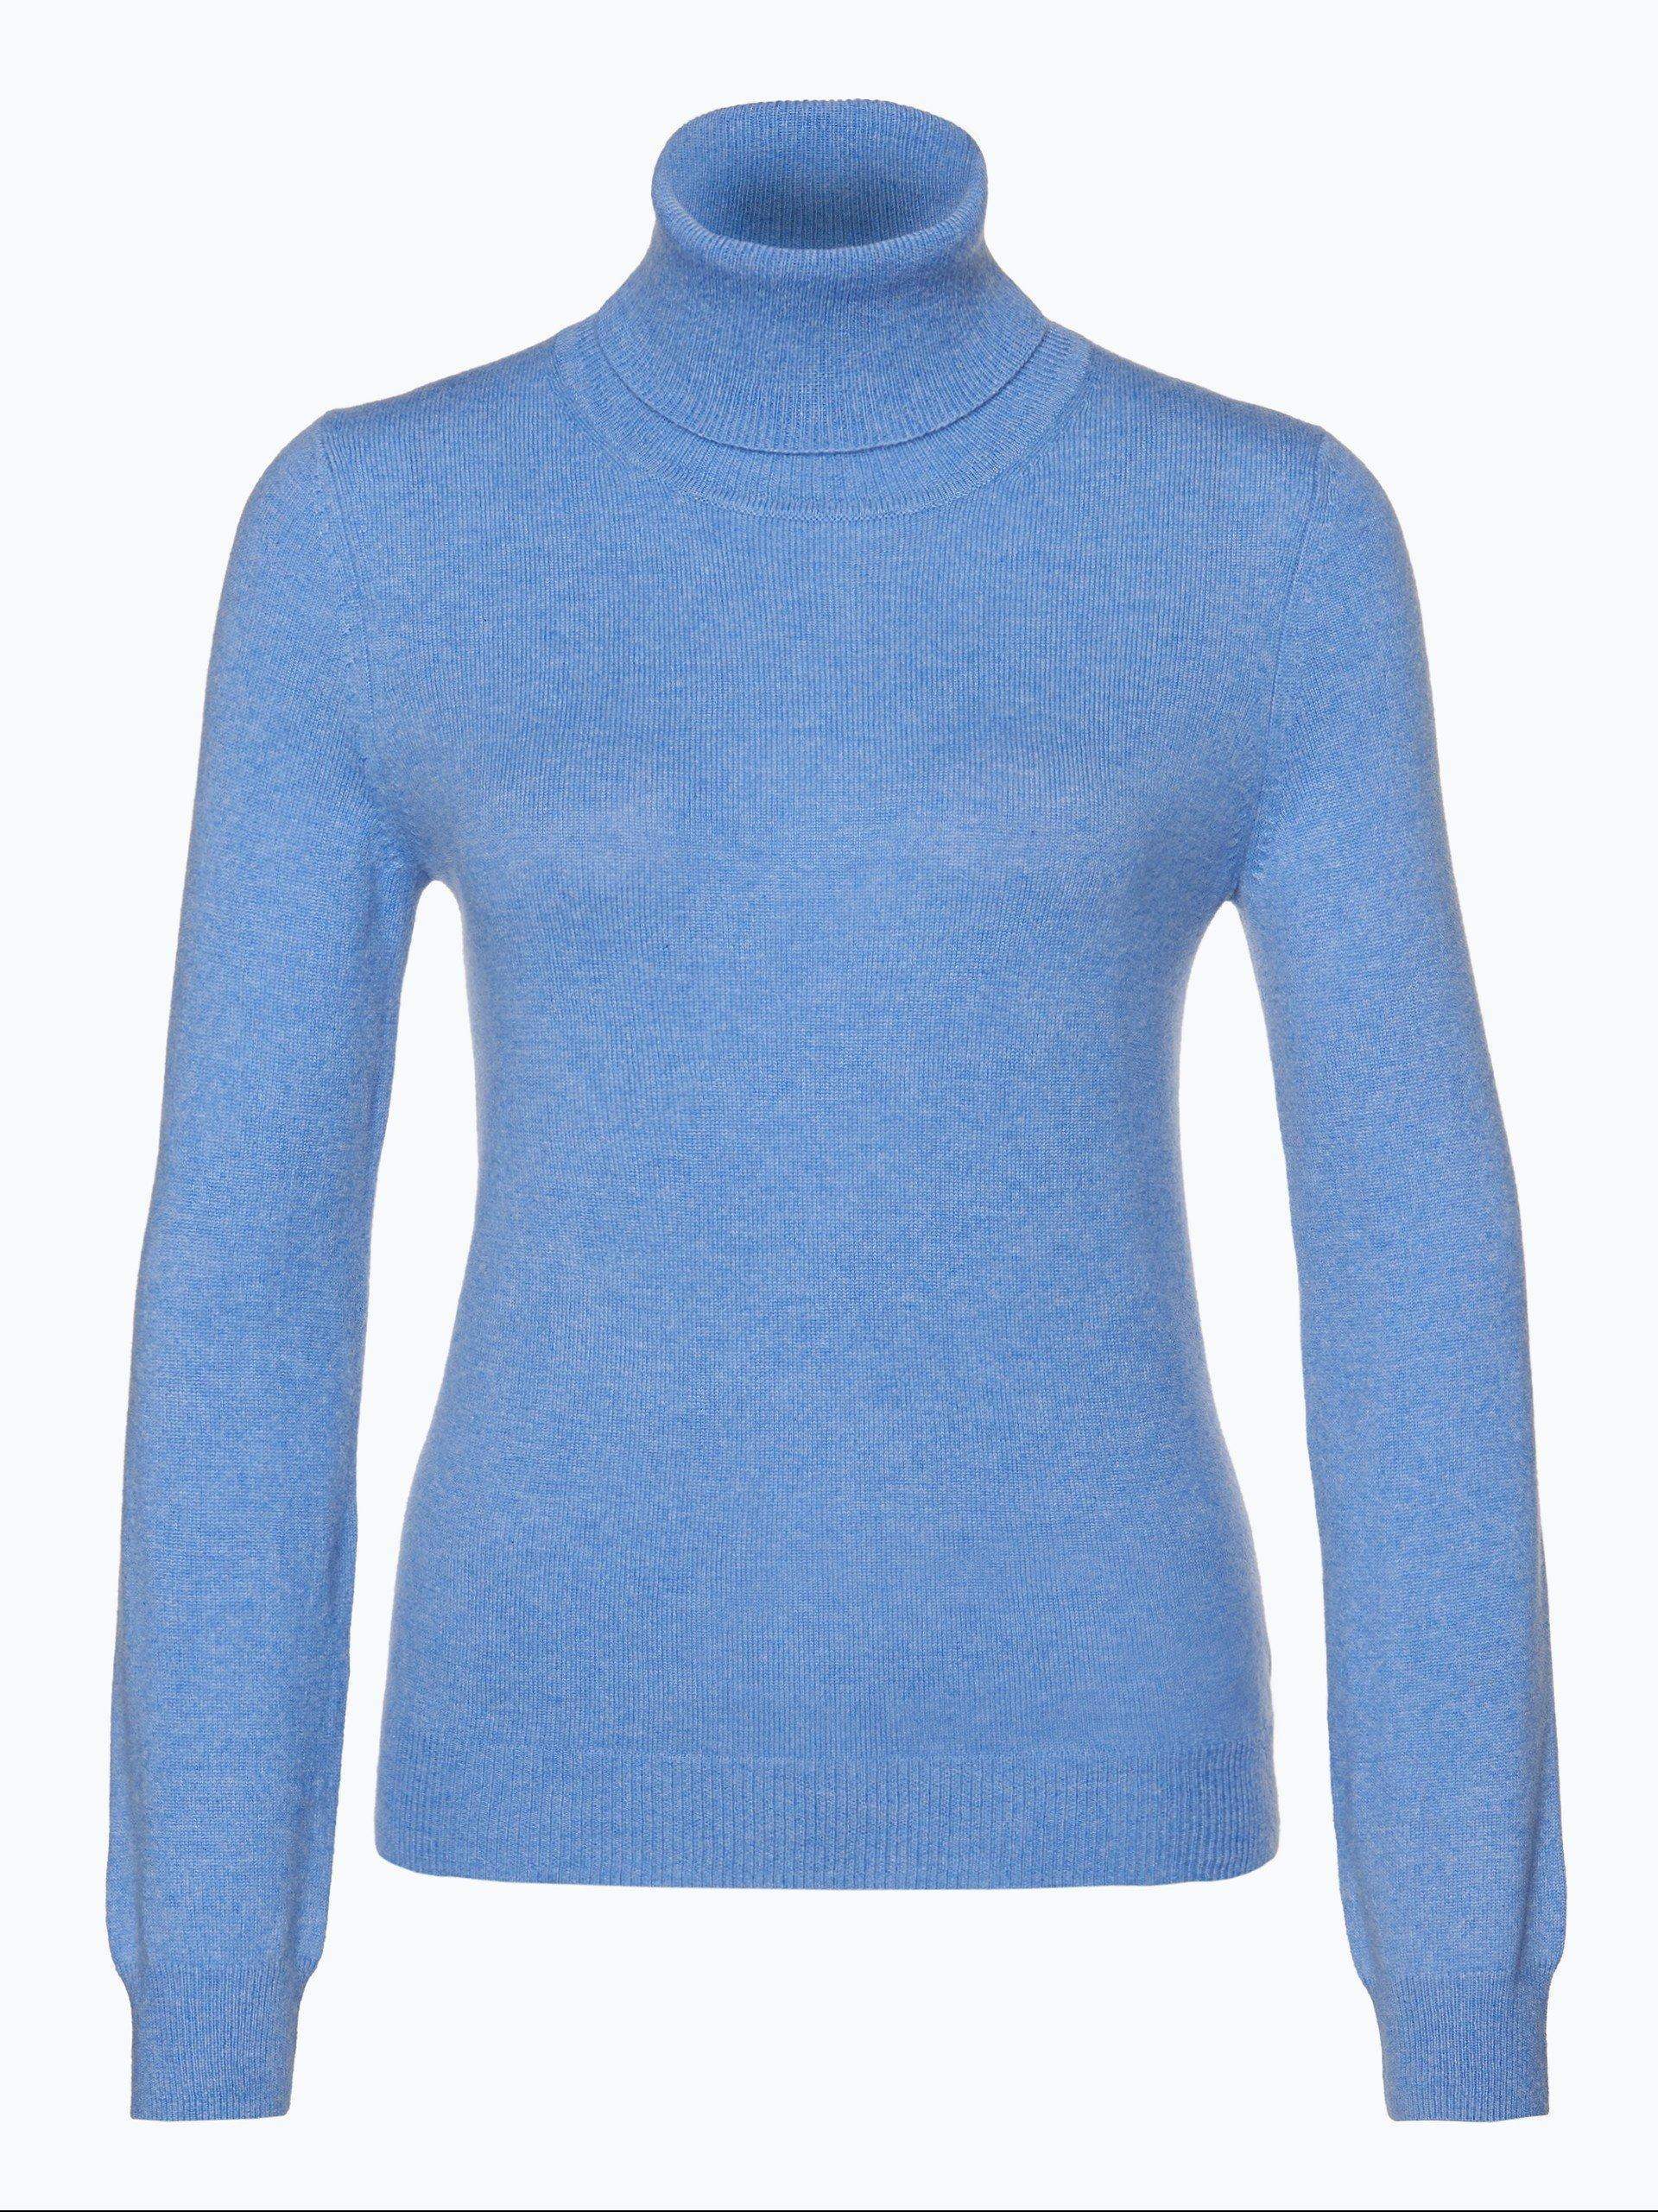 franco callegari damen pure cashmere pullover blau uni online kaufen vangraaf com. Black Bedroom Furniture Sets. Home Design Ideas